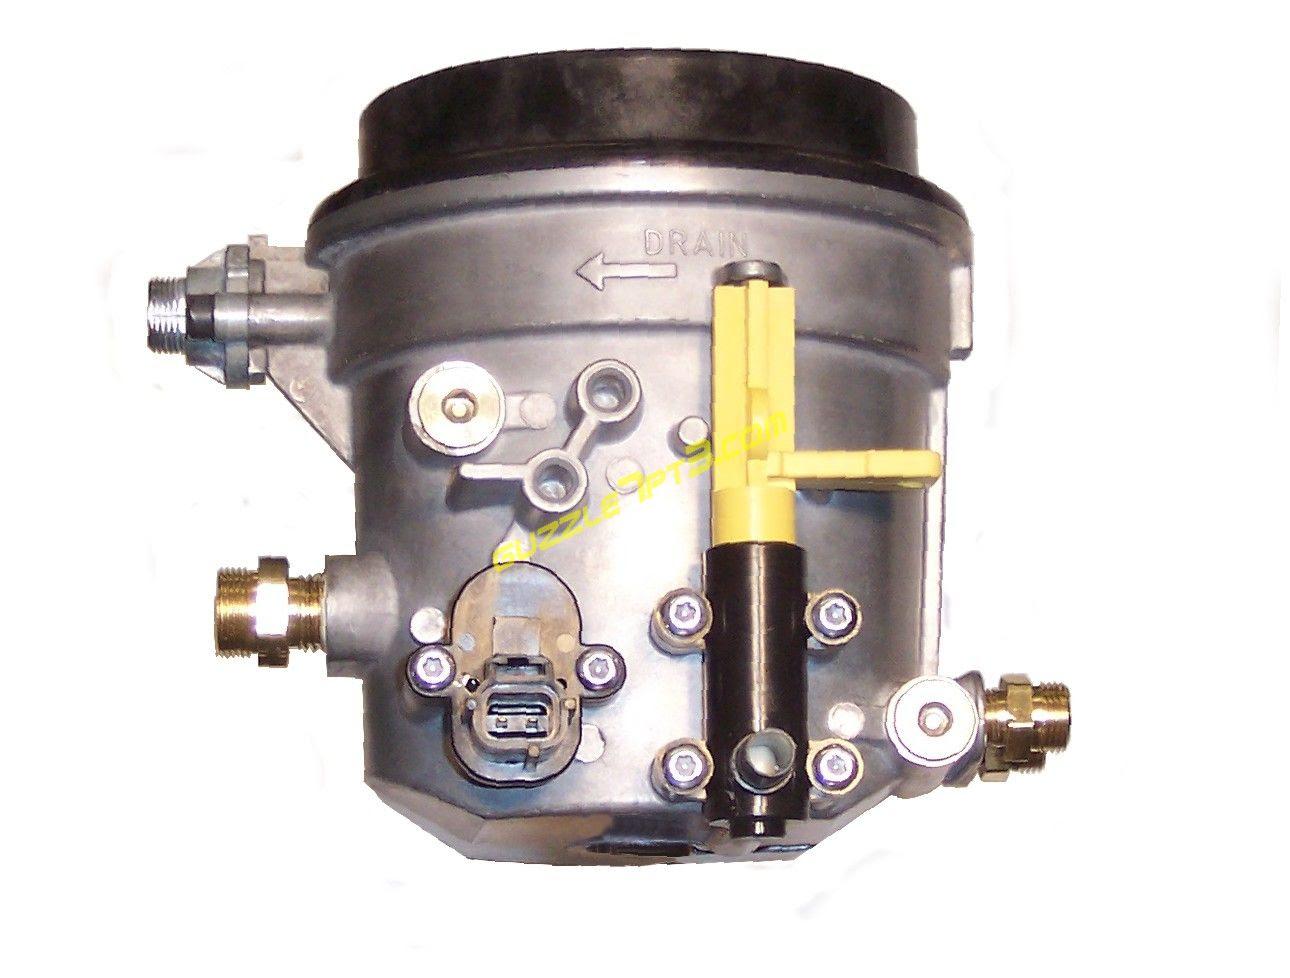 97 Ford F 350 7 3 Diesel Engine Diagram - Wiring Diagram ...